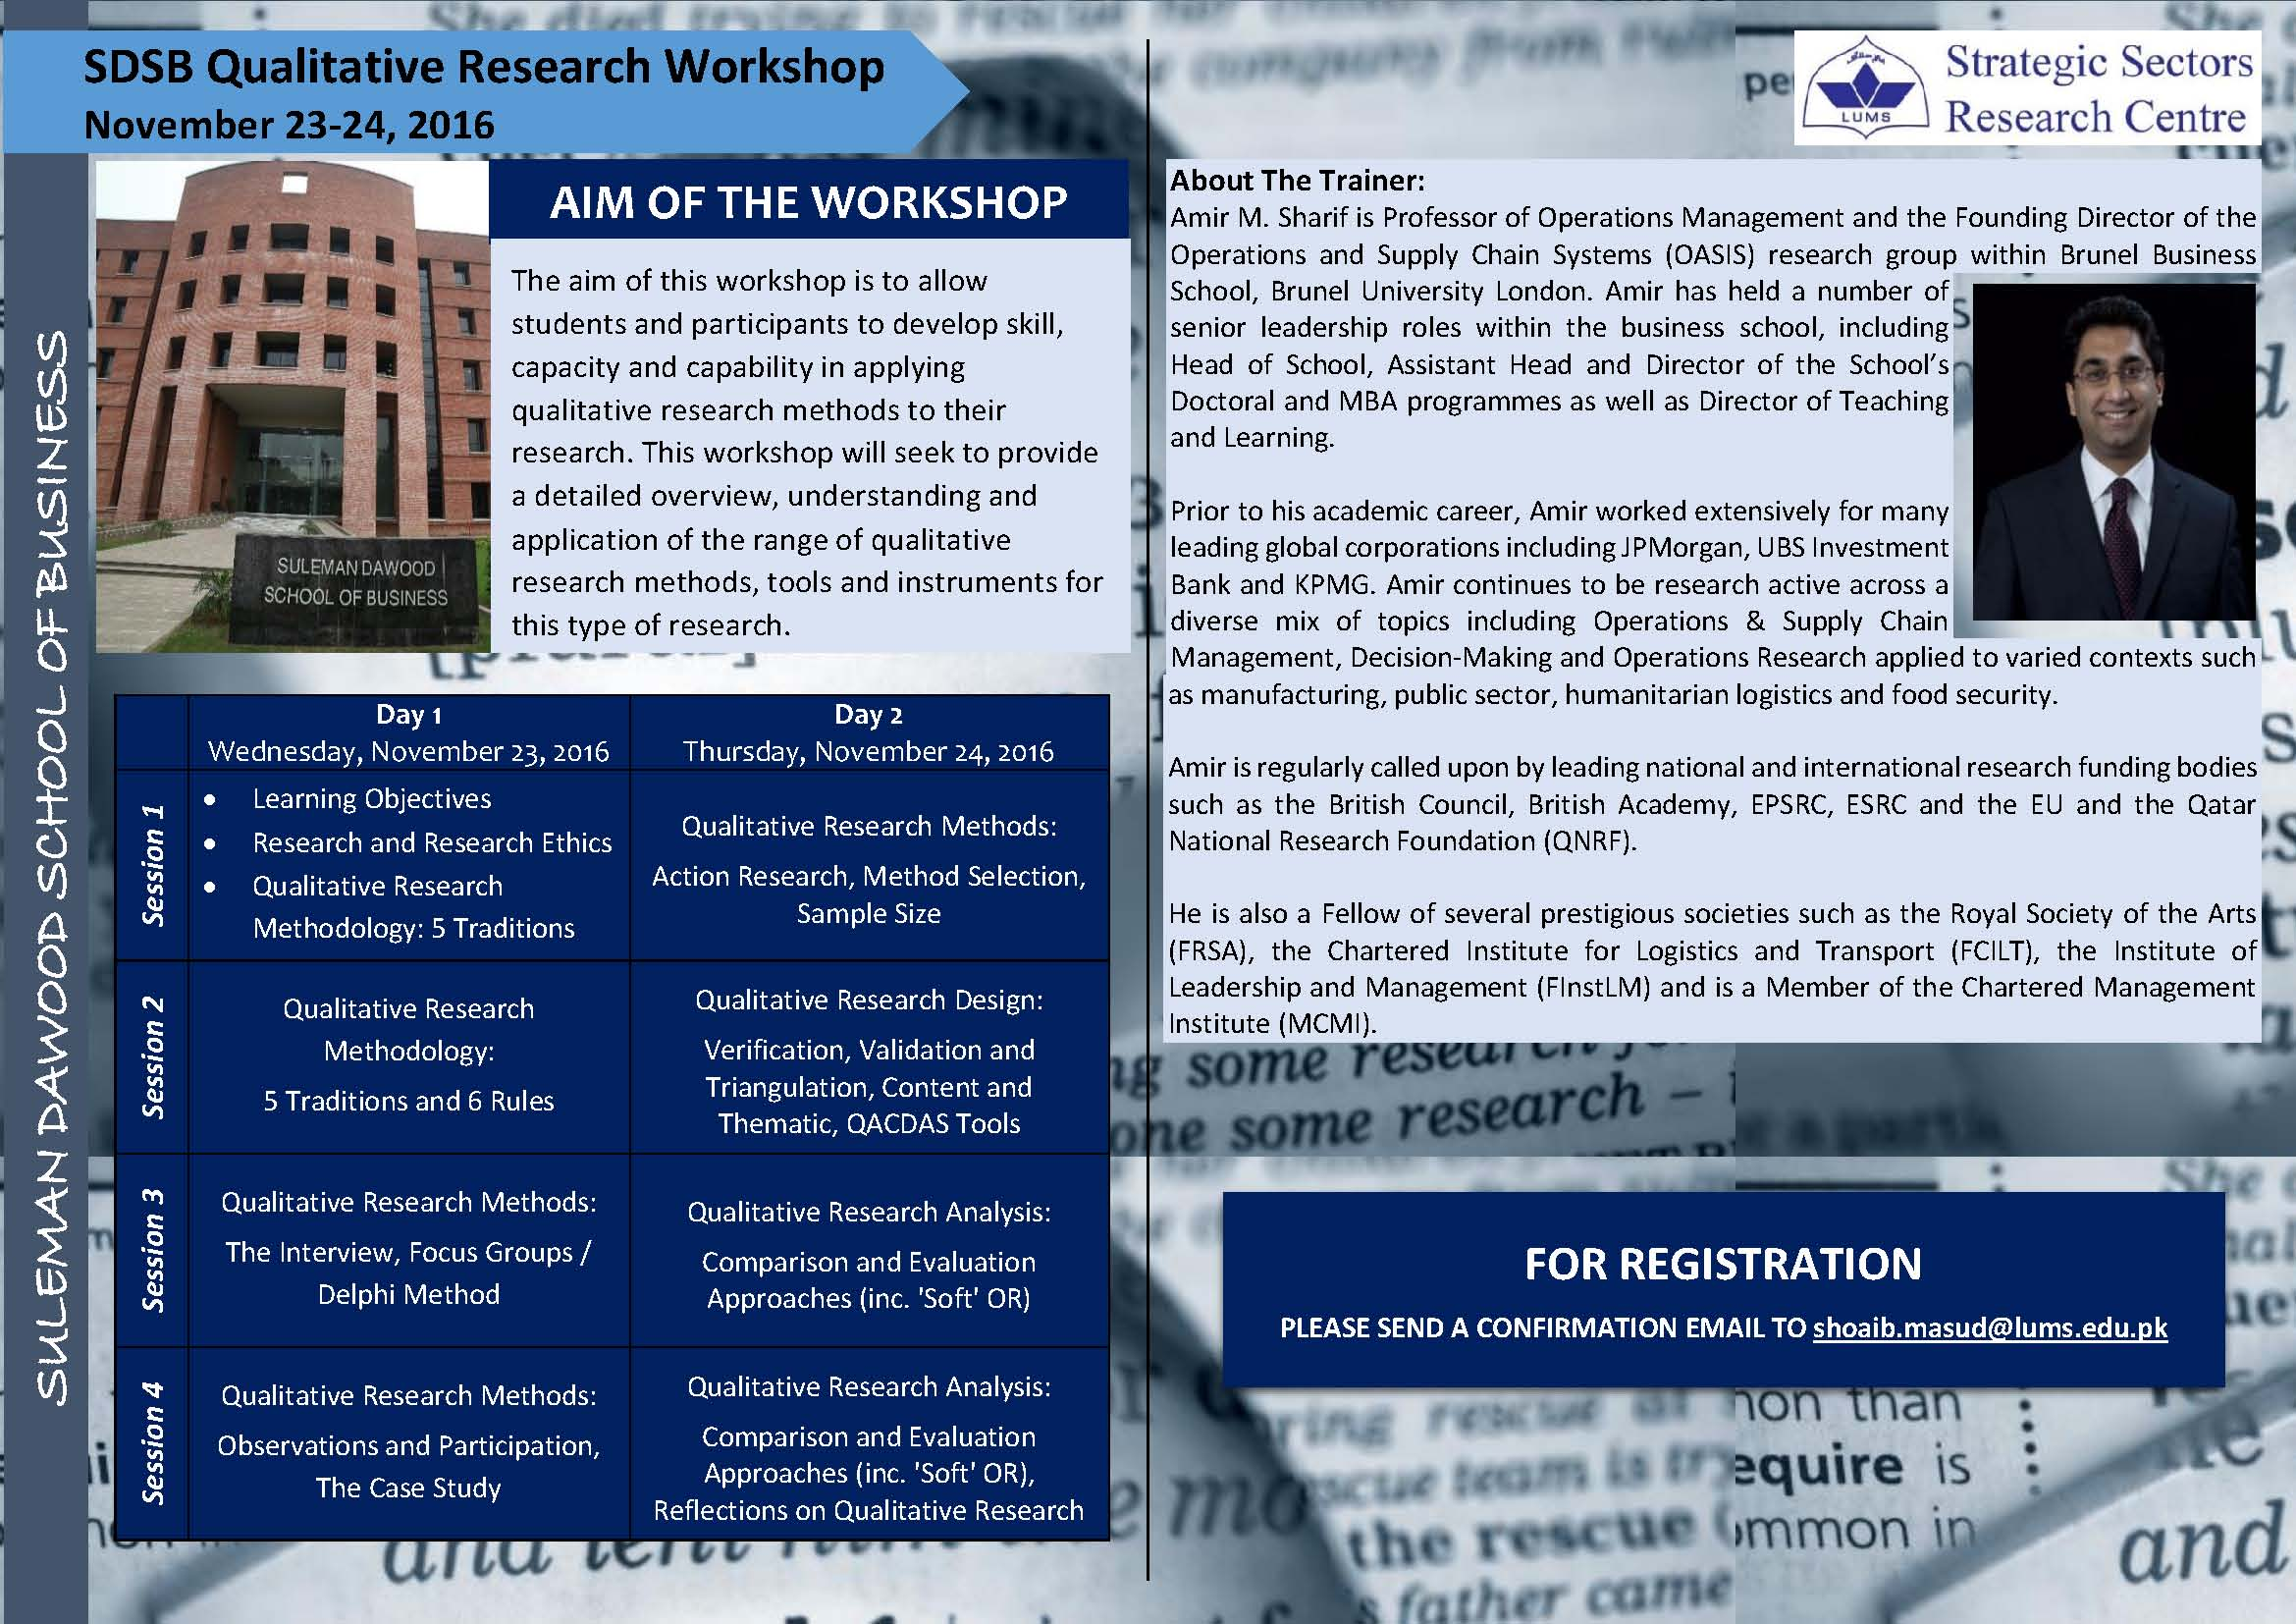 SDSB Qualitative Research Workshop | LUMS